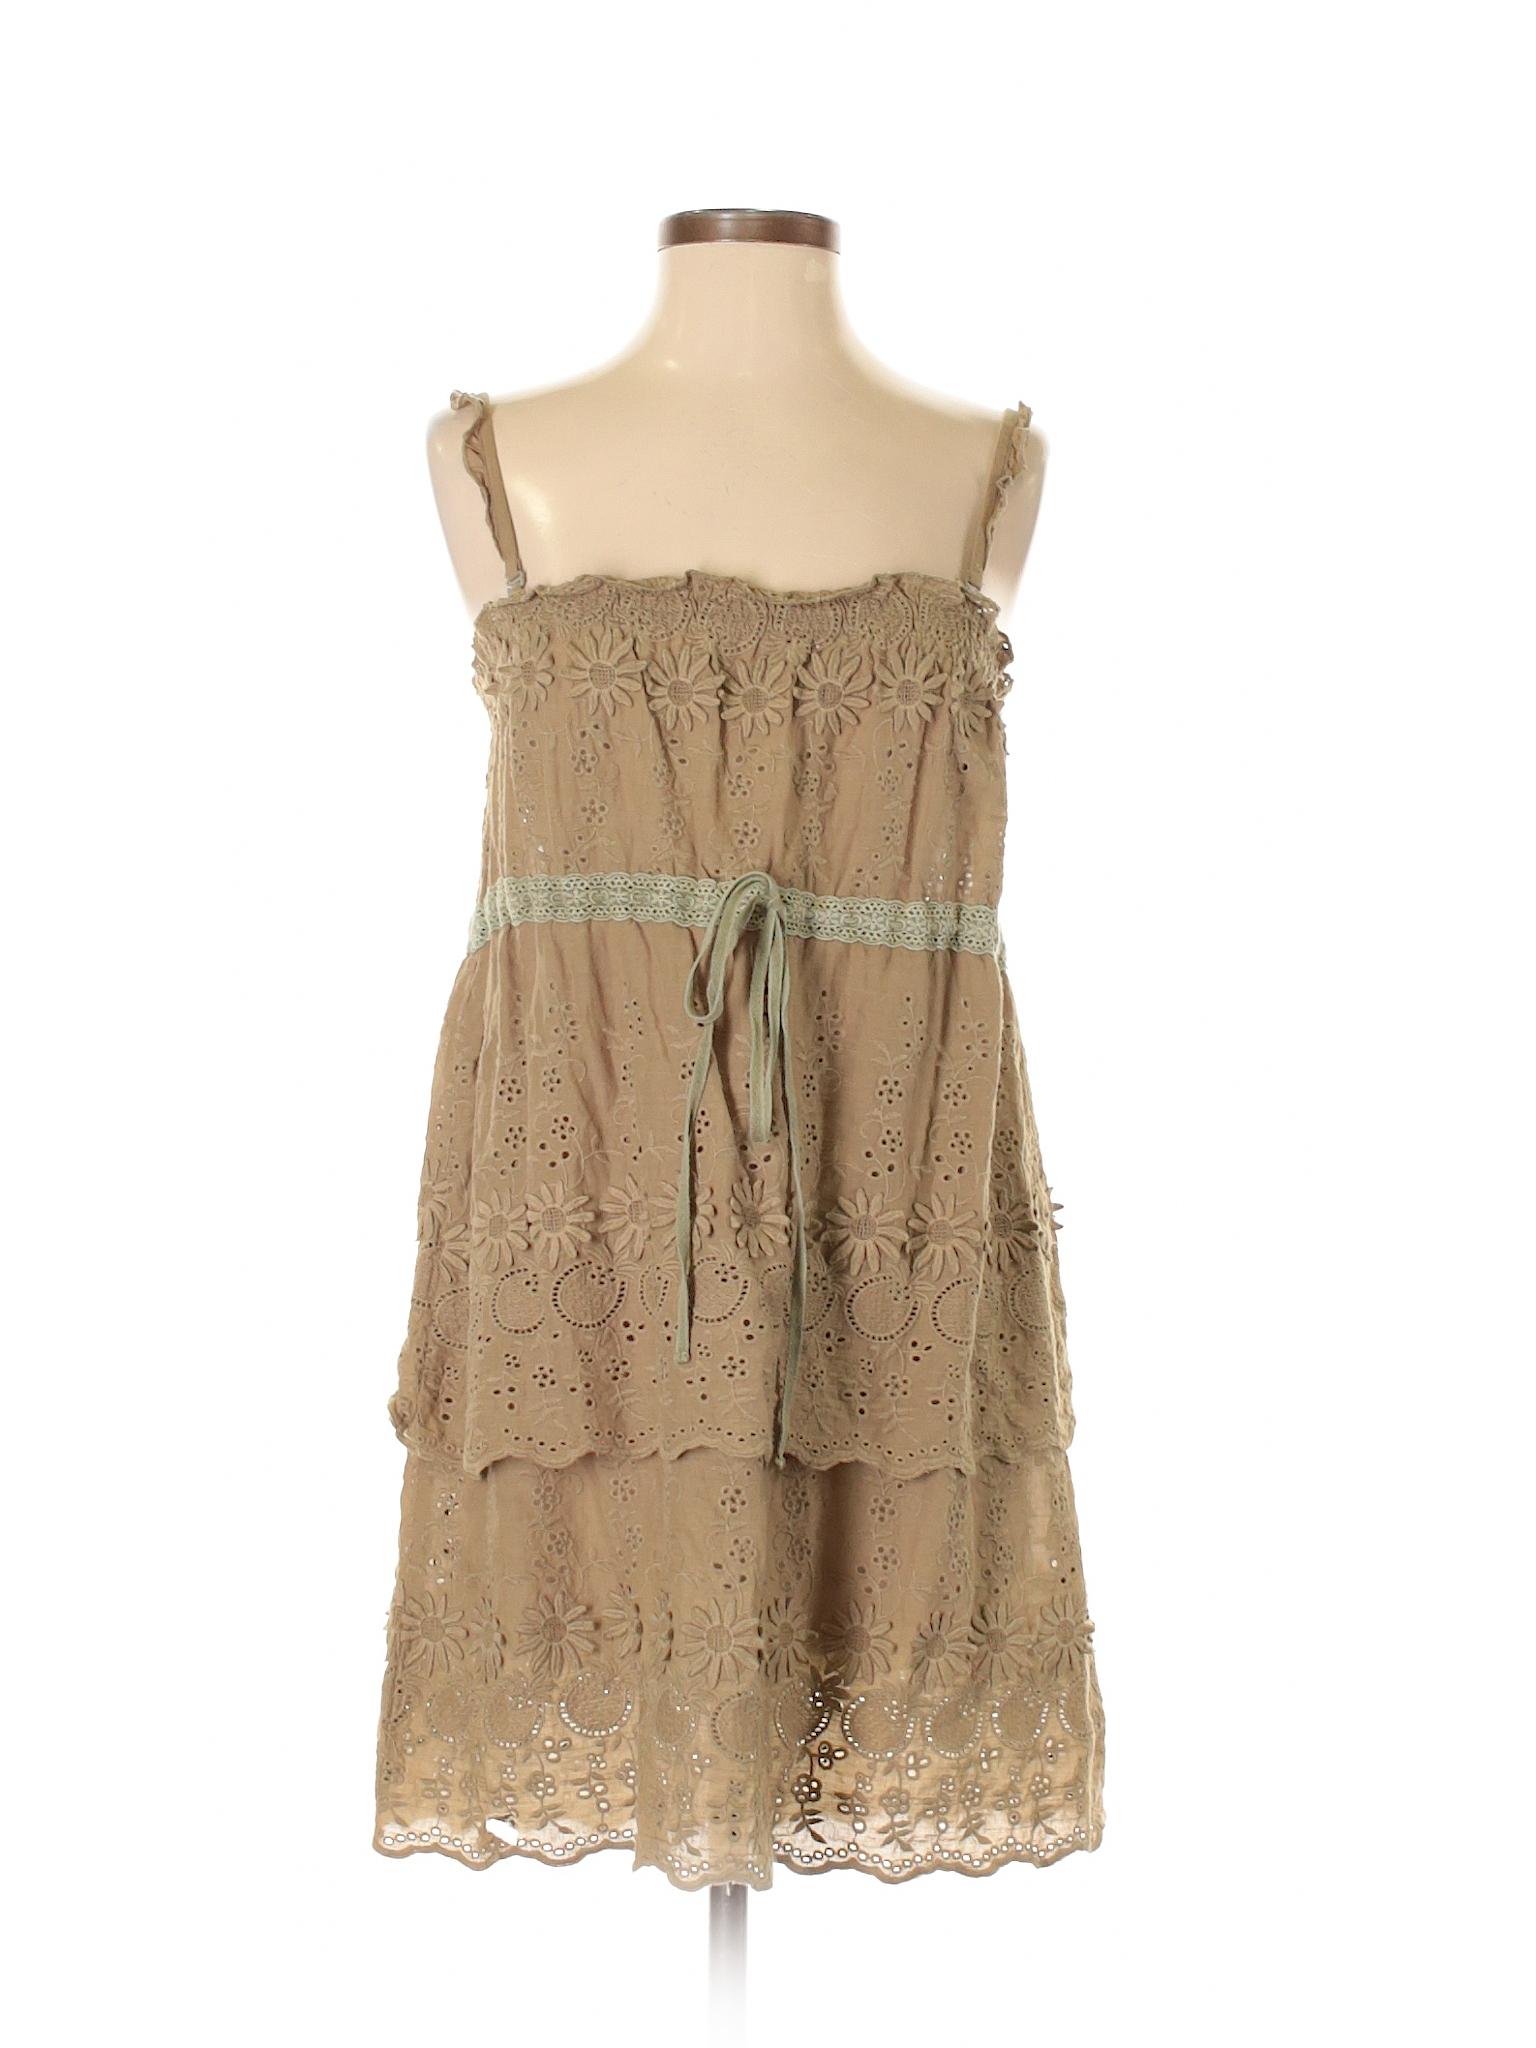 Sweet Dress Sinammon Casual Boutique winter fwg1C5xnq